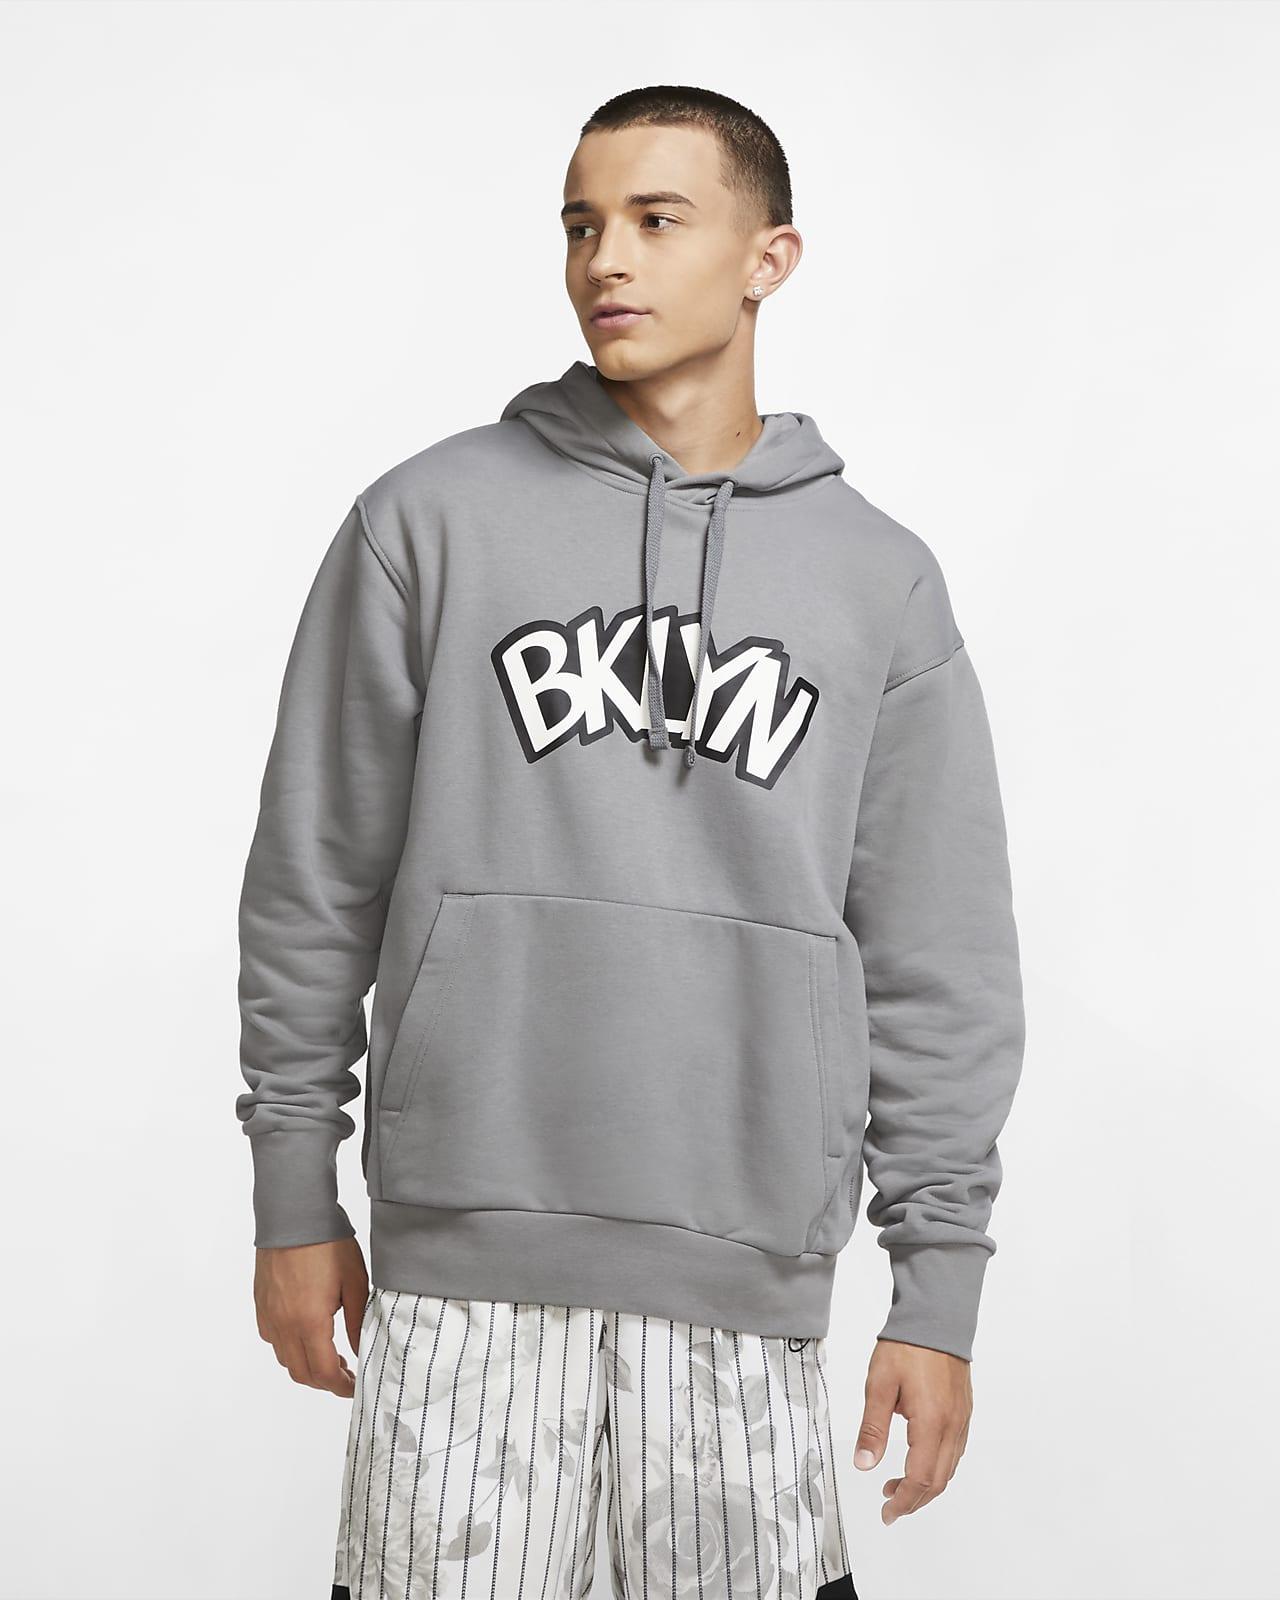 Brooklyn Nets Statement Edition Men's Jordan NBA Hoodie